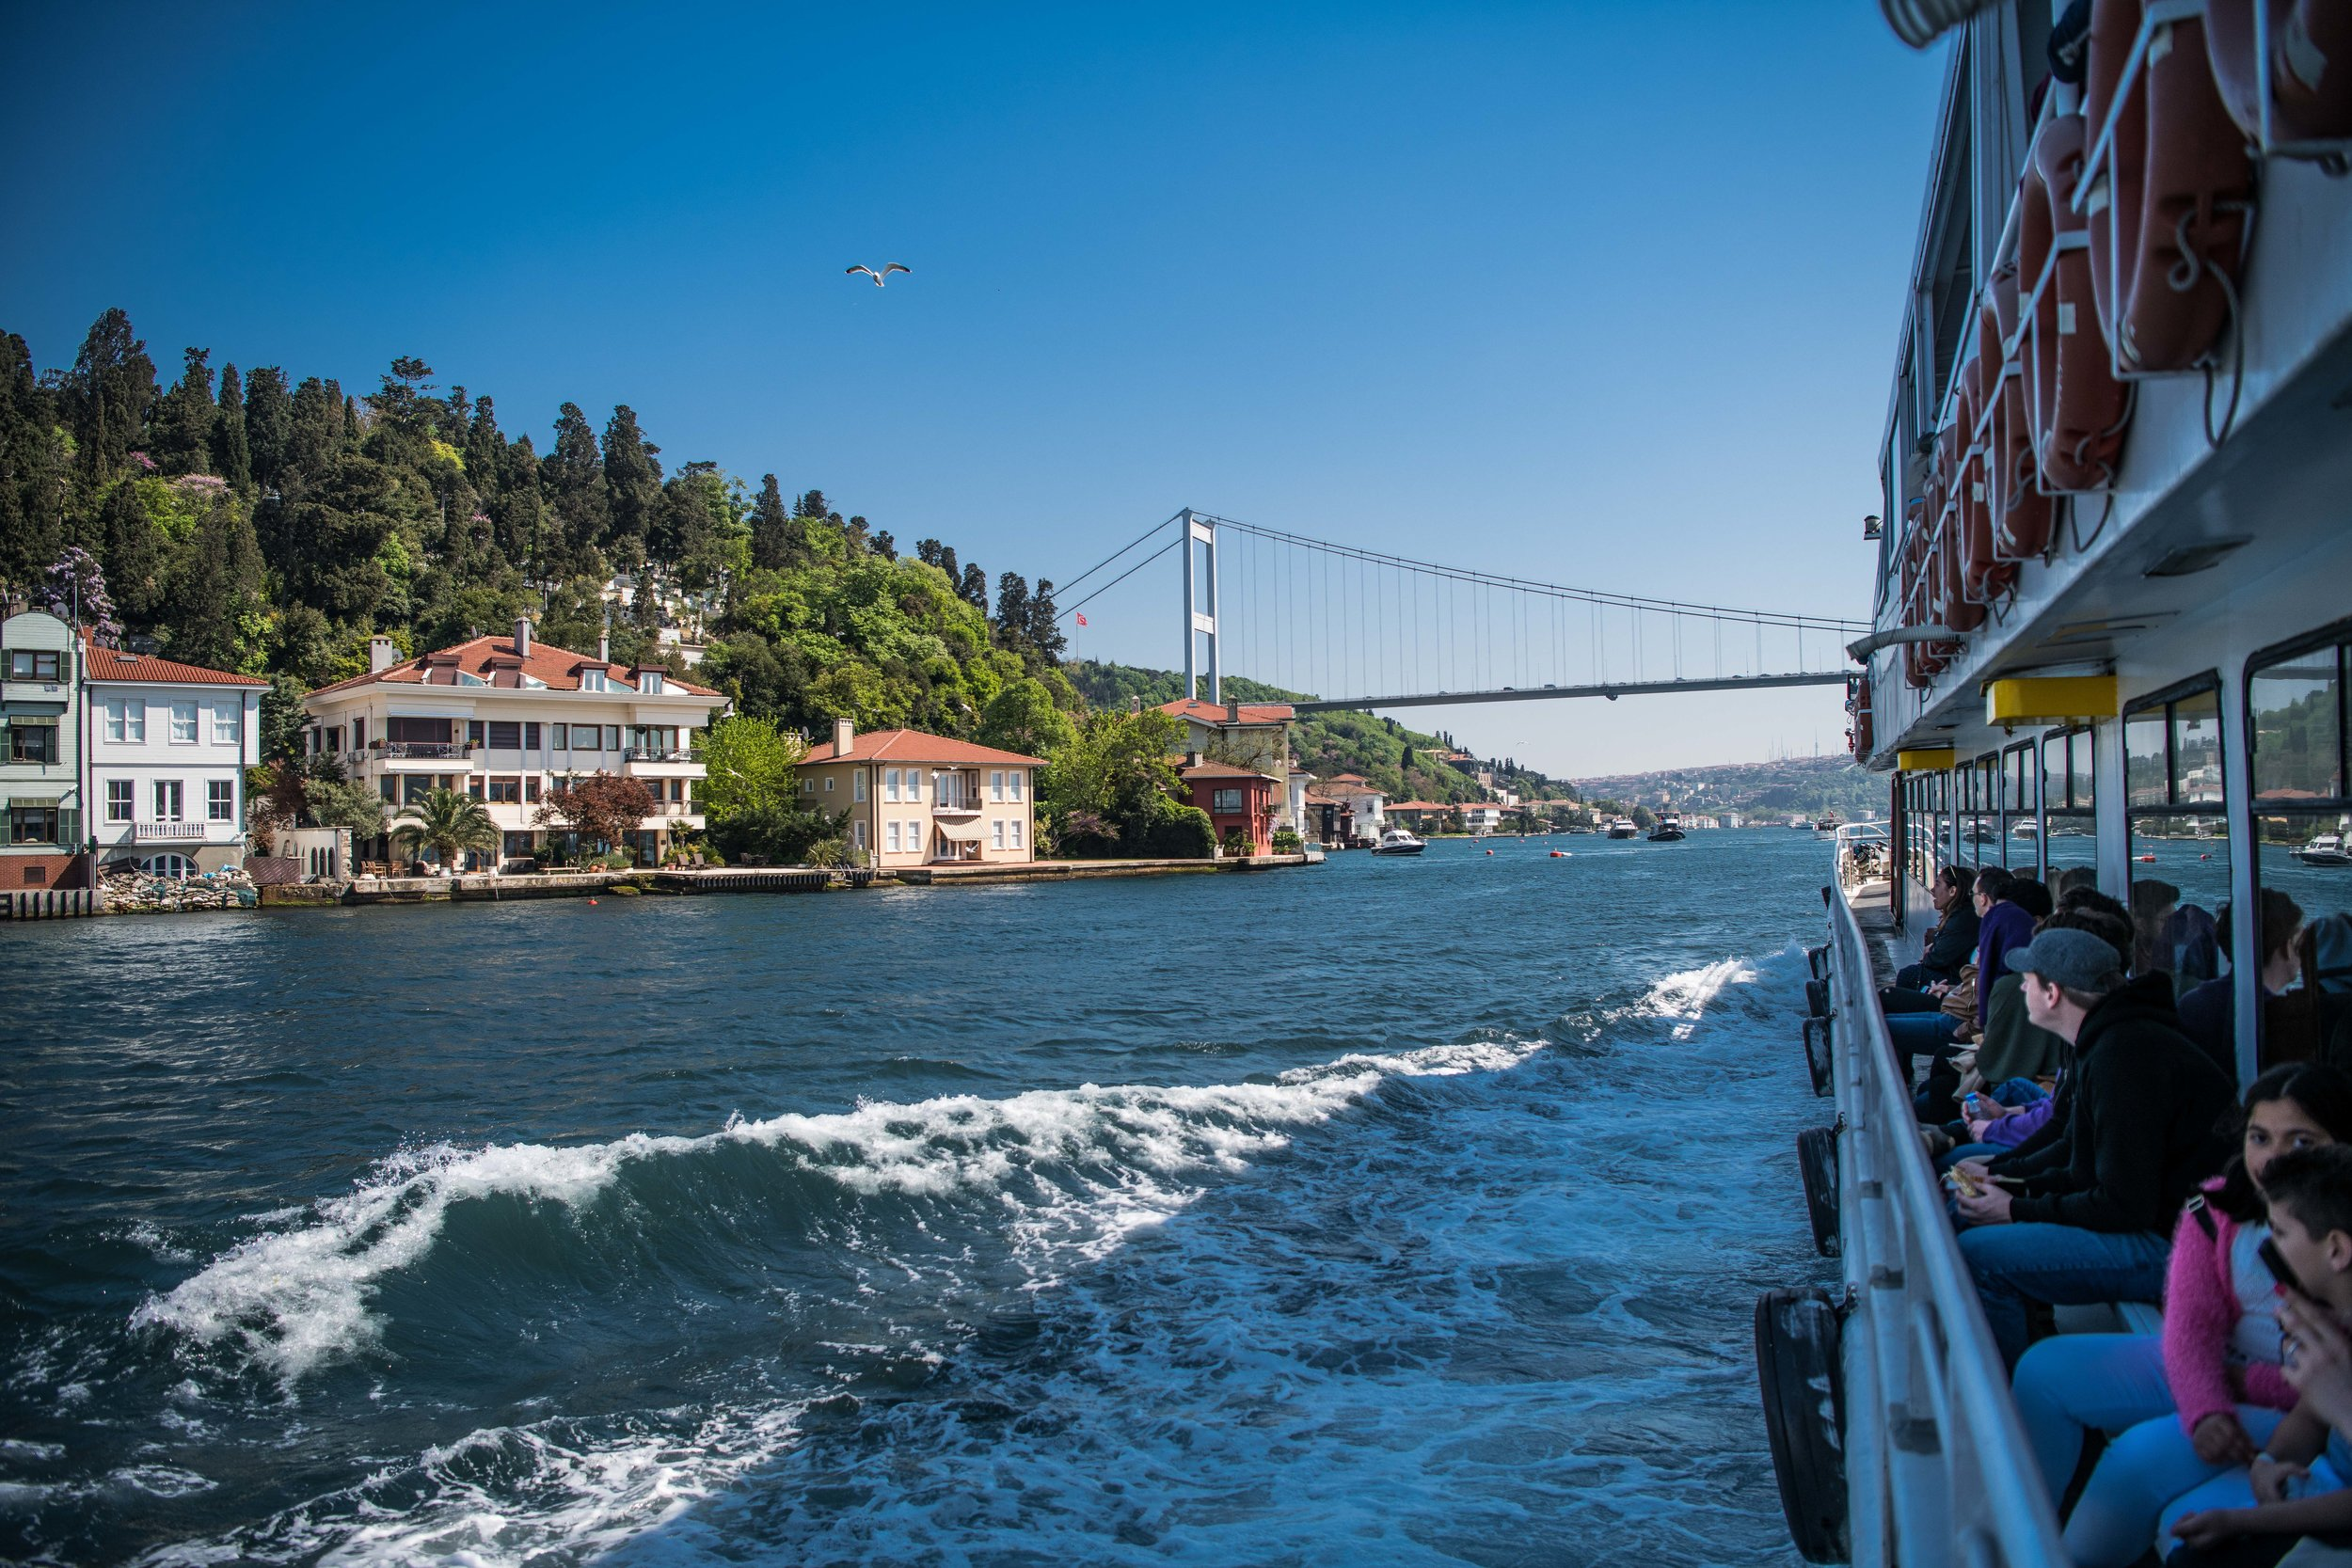 thetravelhub_istanbul_bosphorus-3925.jpg